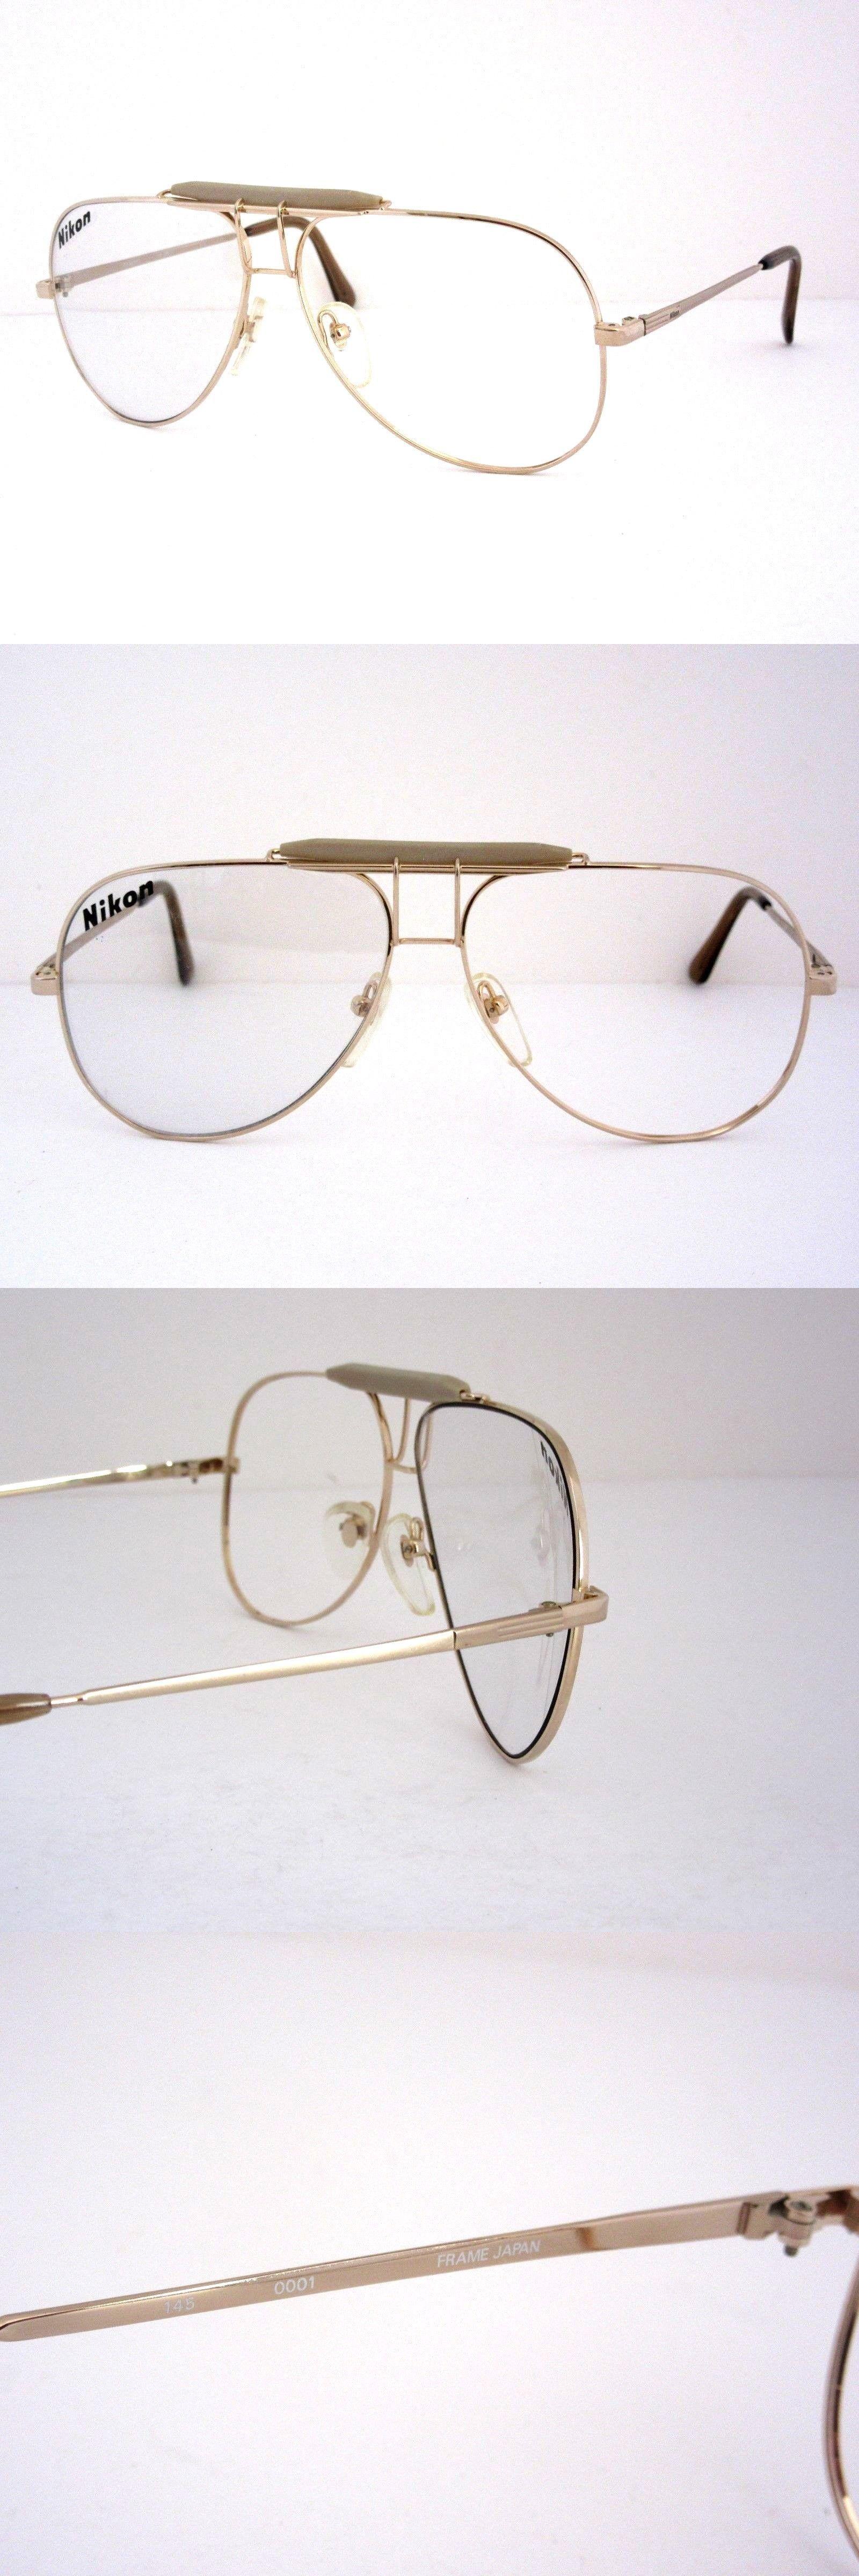 Eyeglasses 175805: Nikon Nk 5403 Men S Large Aviator Eyeglass Frames ...